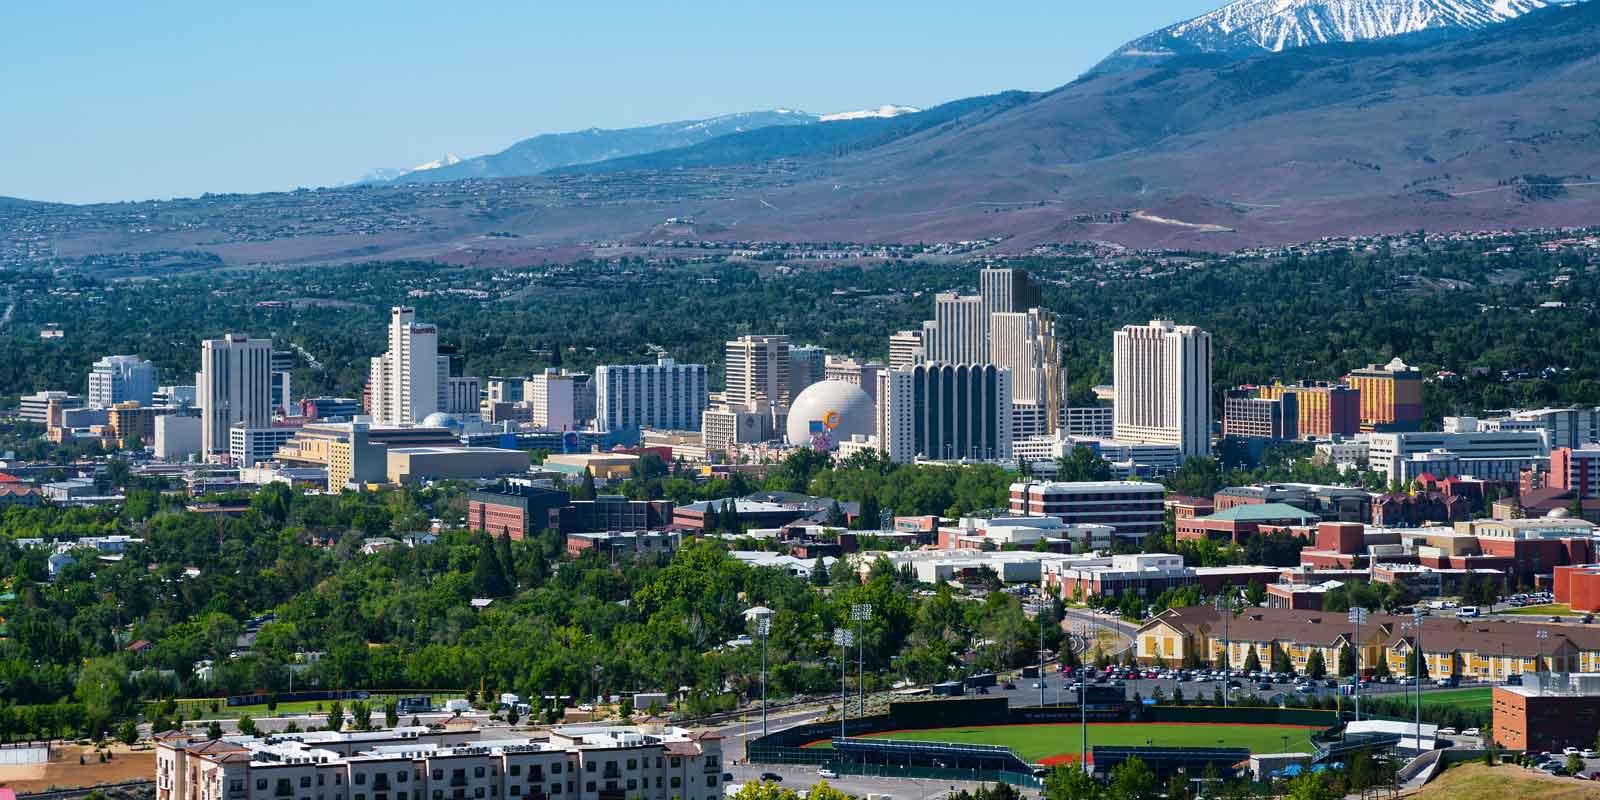 Skyline of Reno, NV